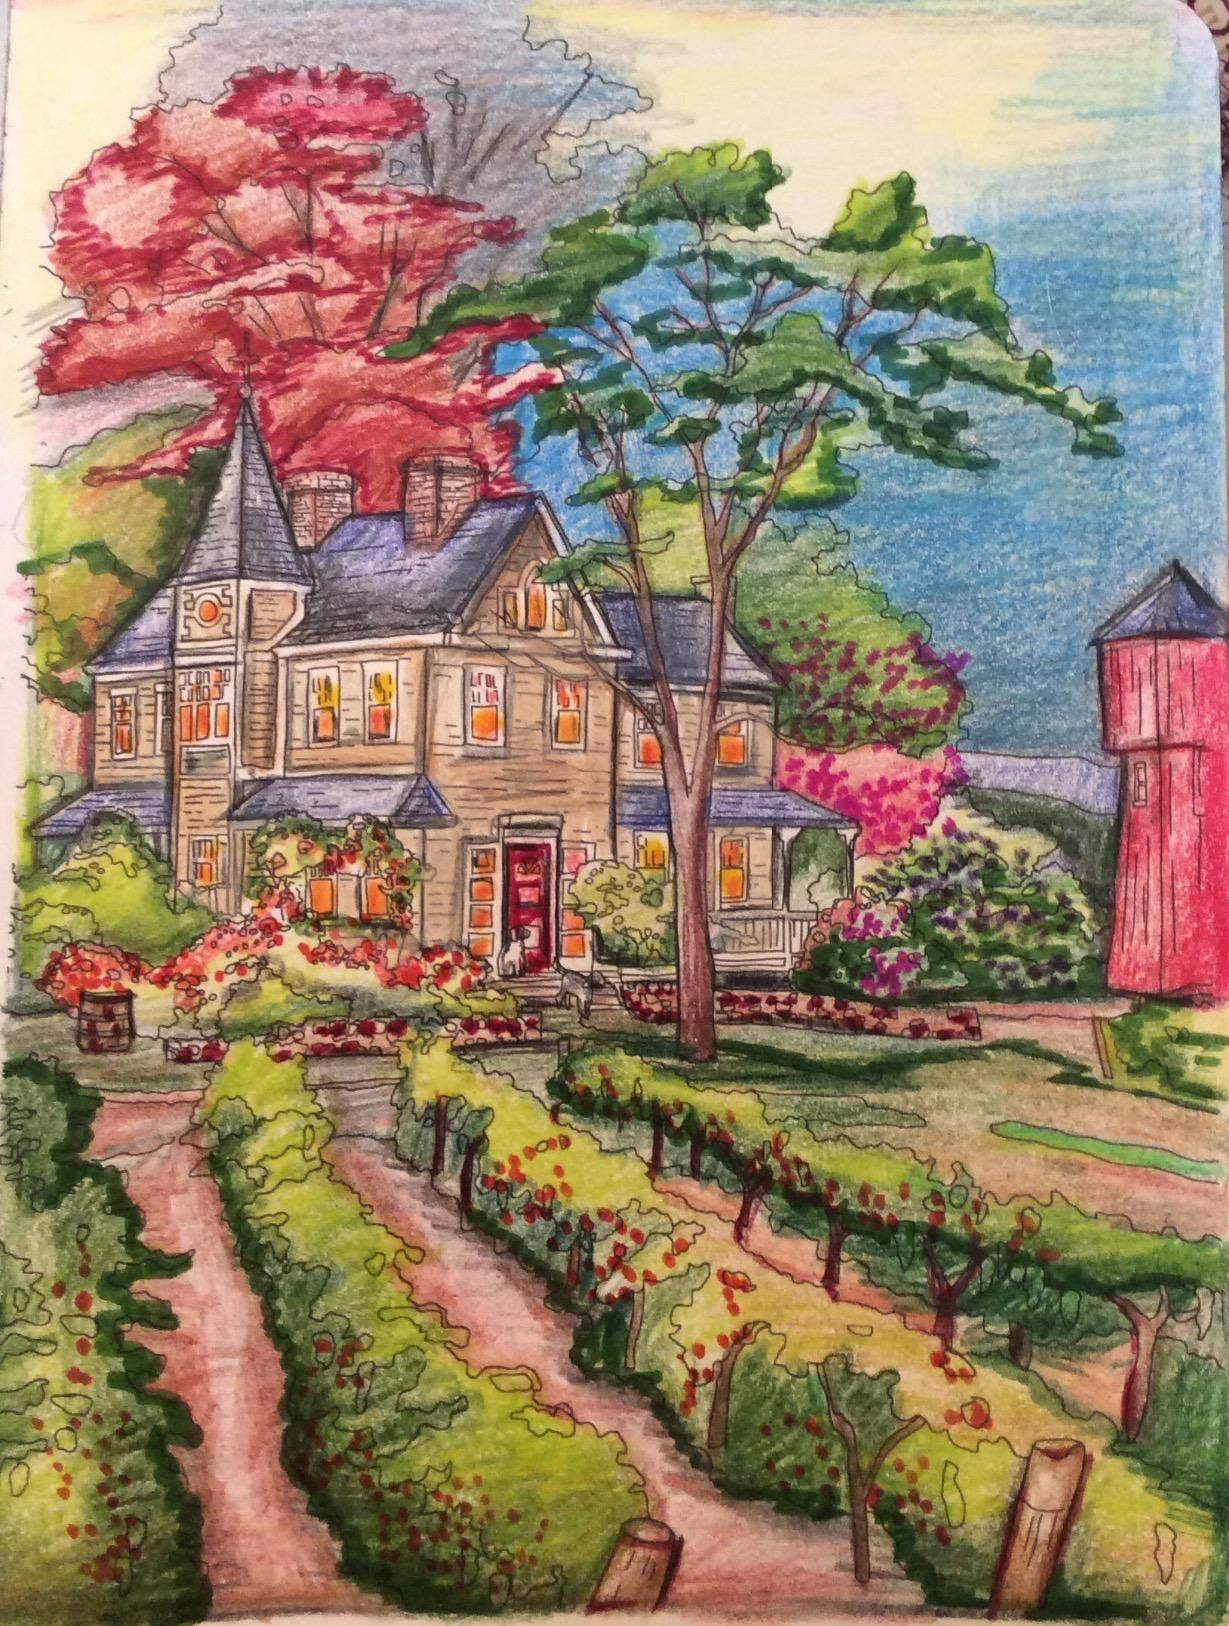 - Amazon.com: Posh Adult Coloring Book: Thomas Kinkade Designs For